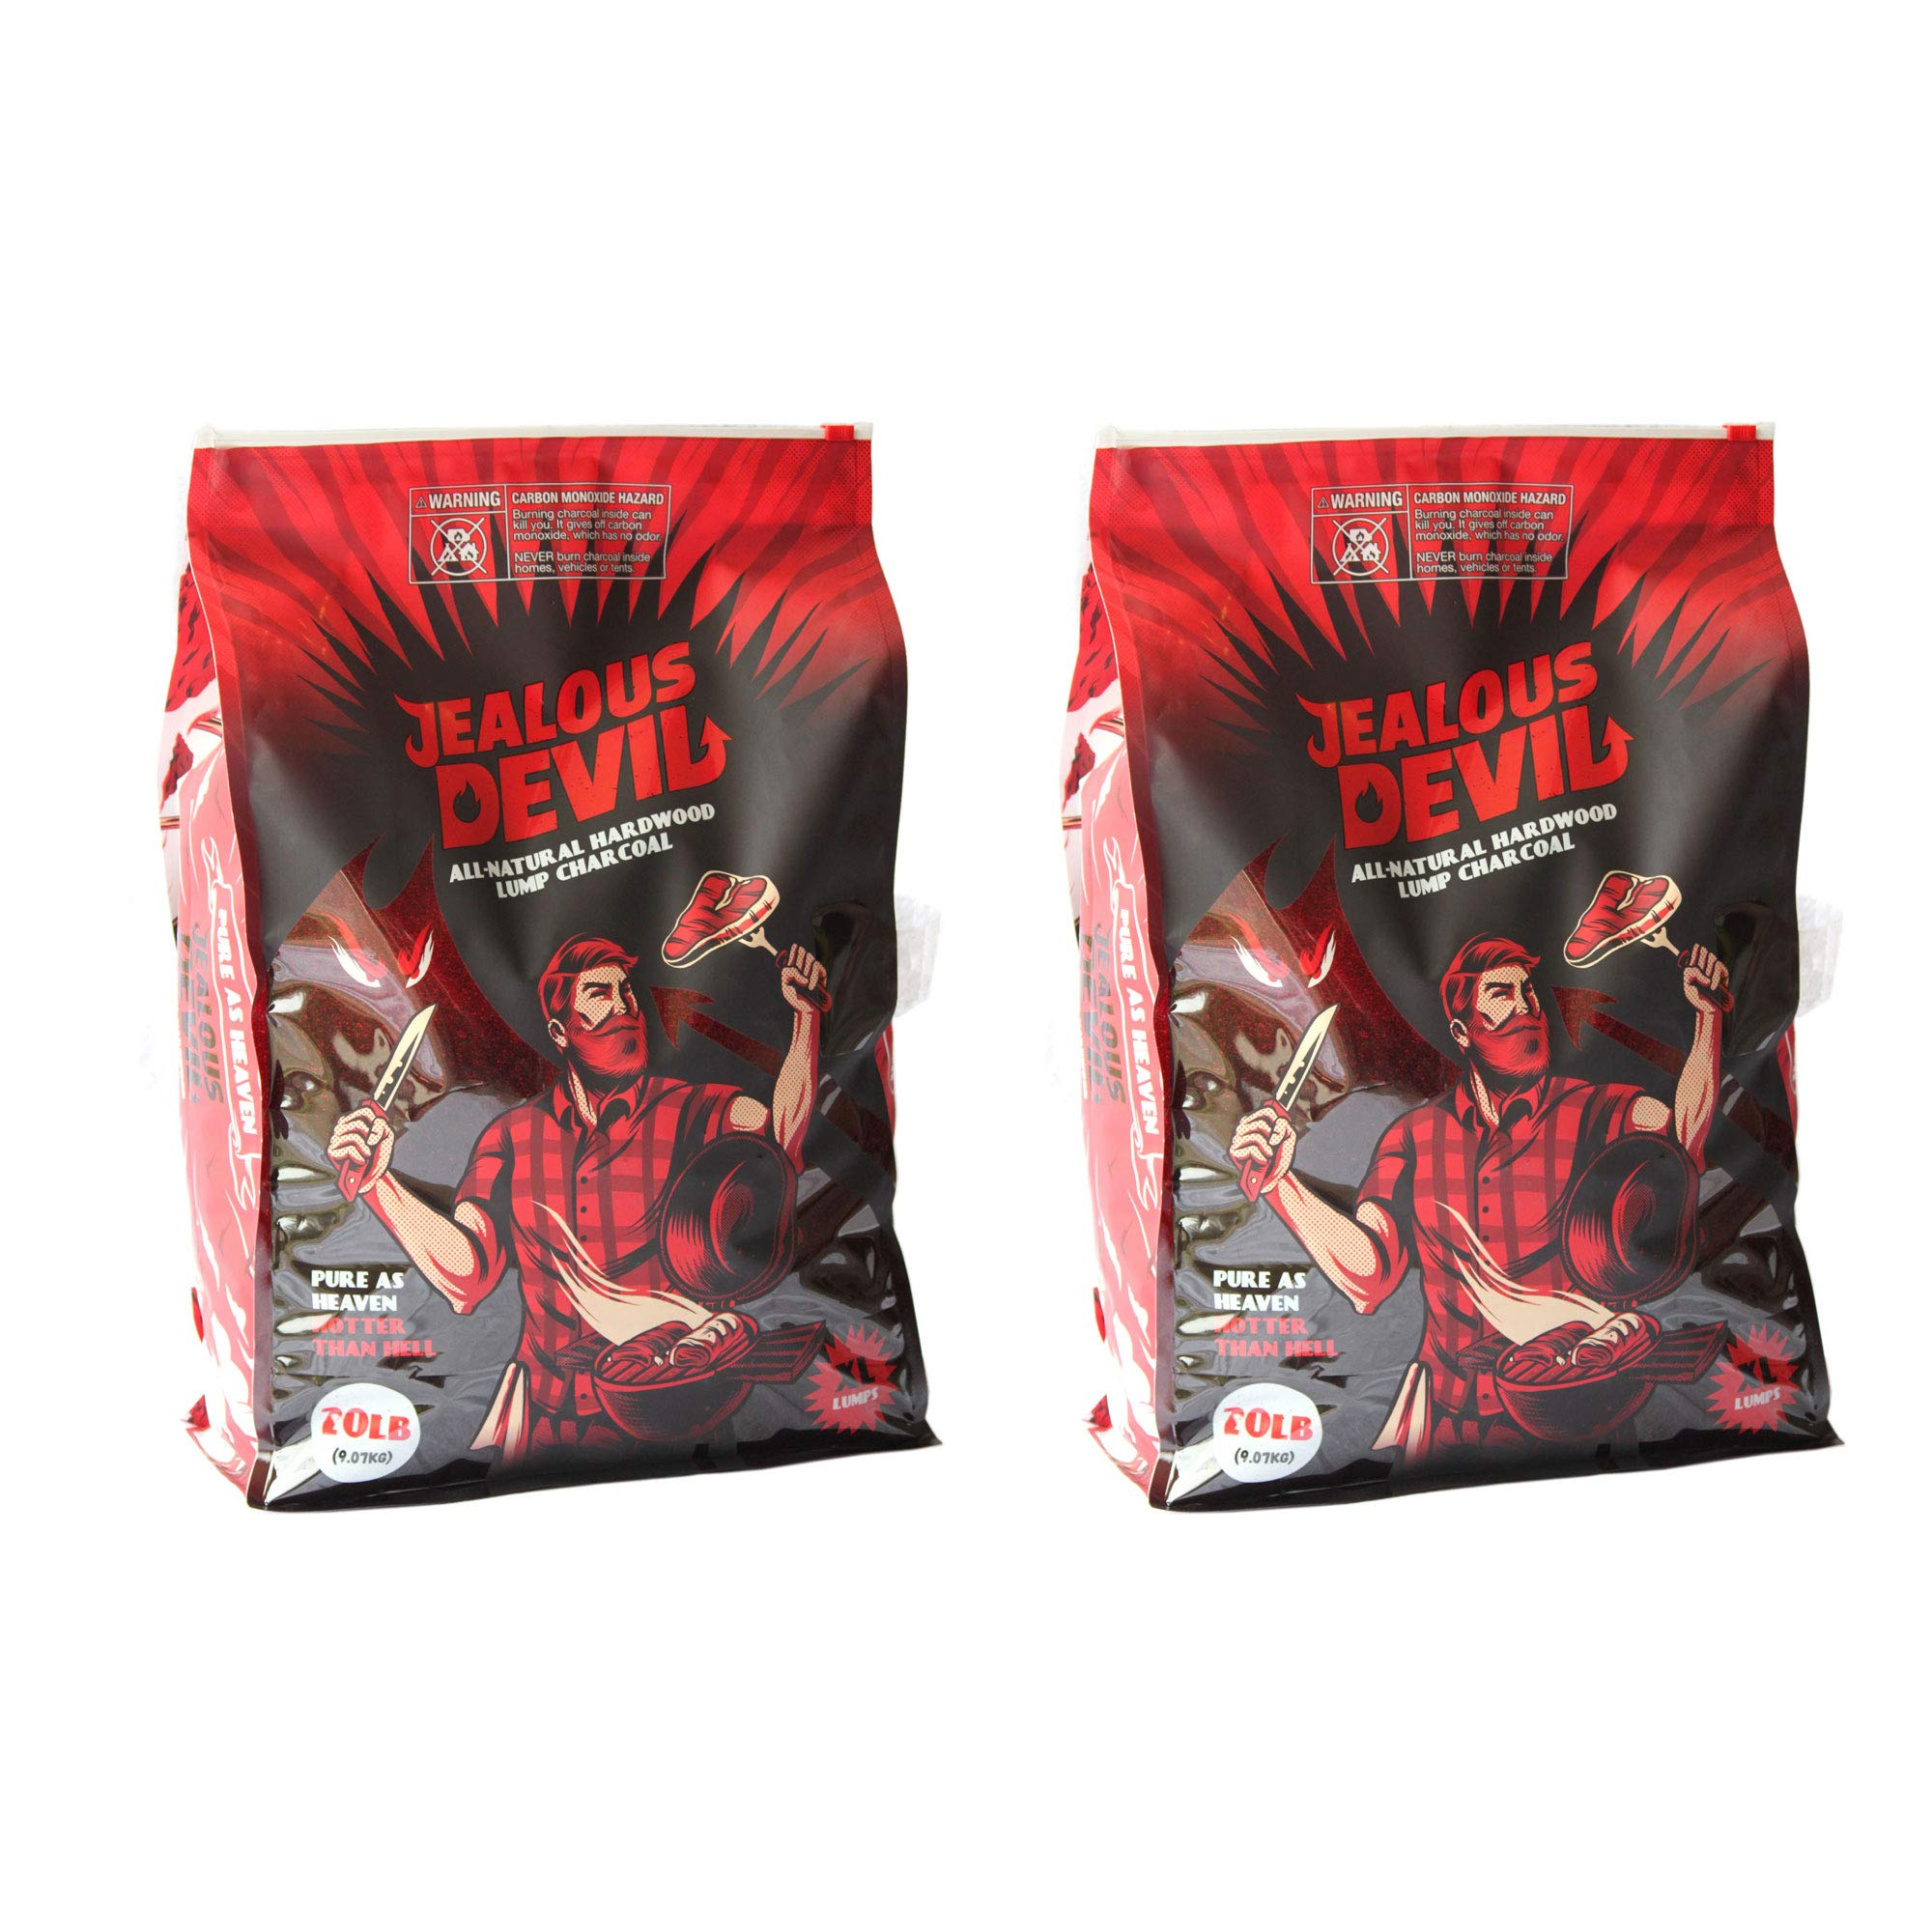 Jealous Devil All Natural Hardwood Lump Charcoal (2-20lb Bags)